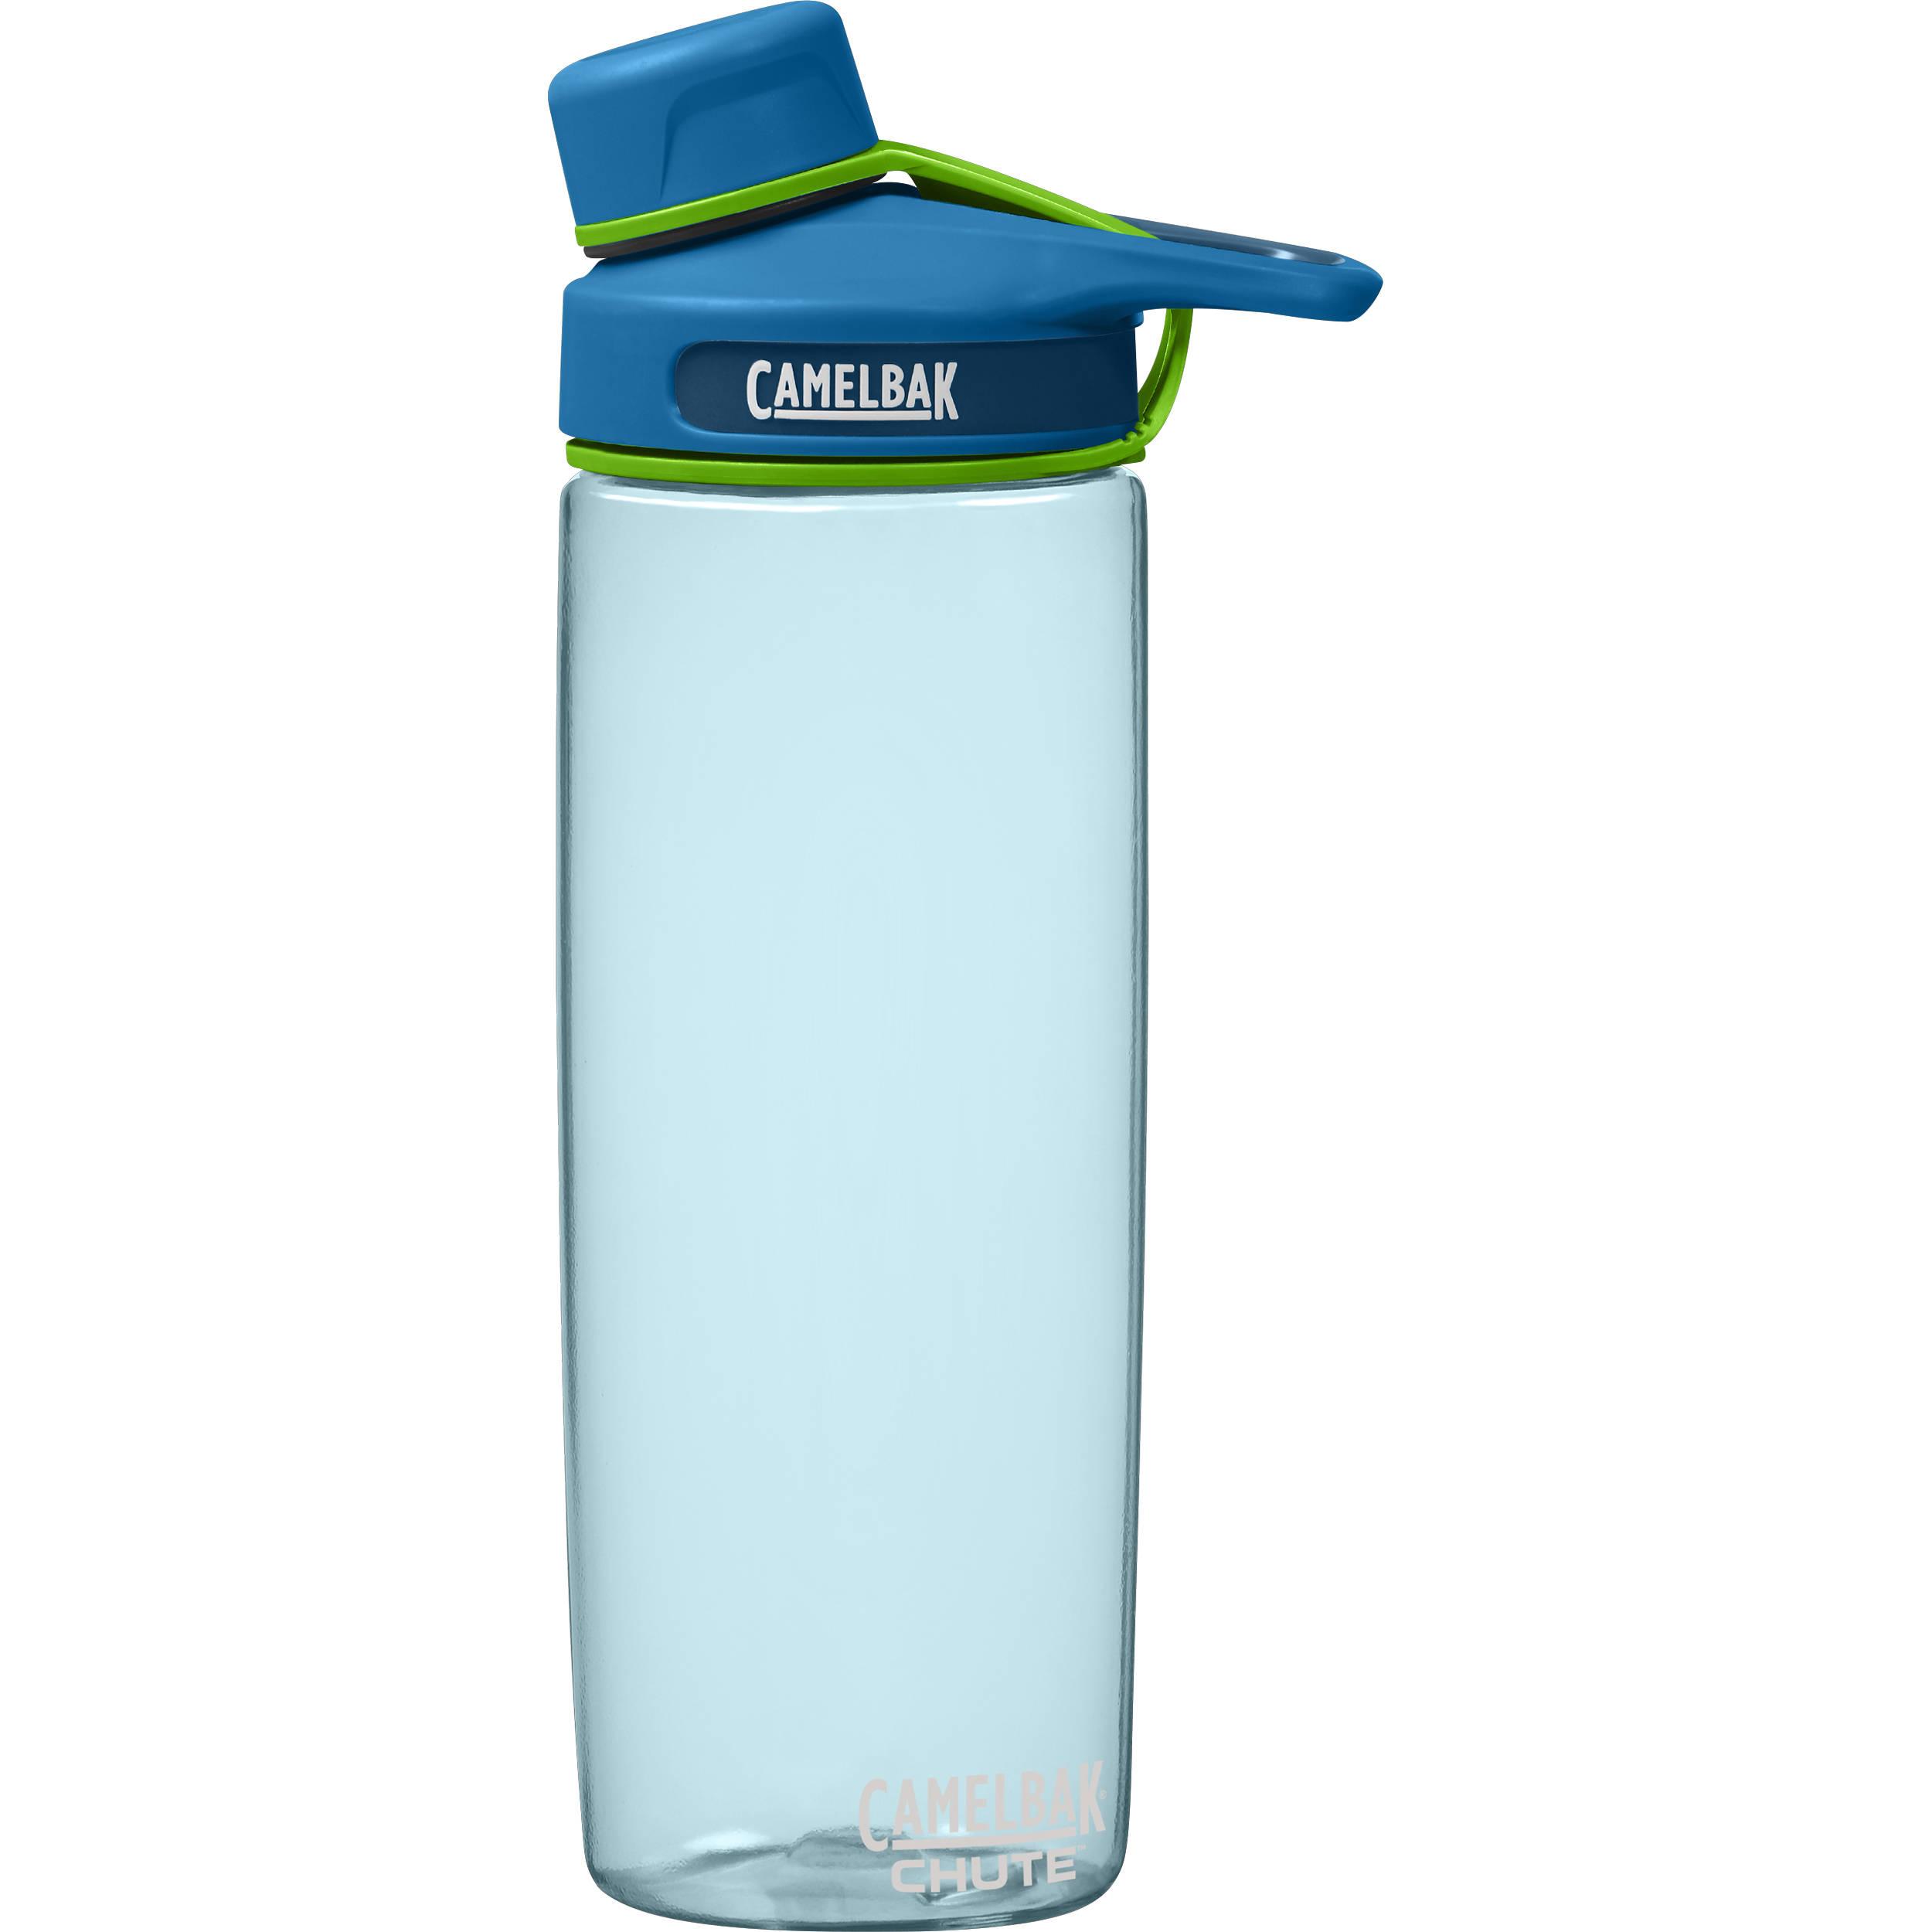 CAMELBAK Chute .6L Water Bottle (Blastoff Blue) 53649 B&H ...